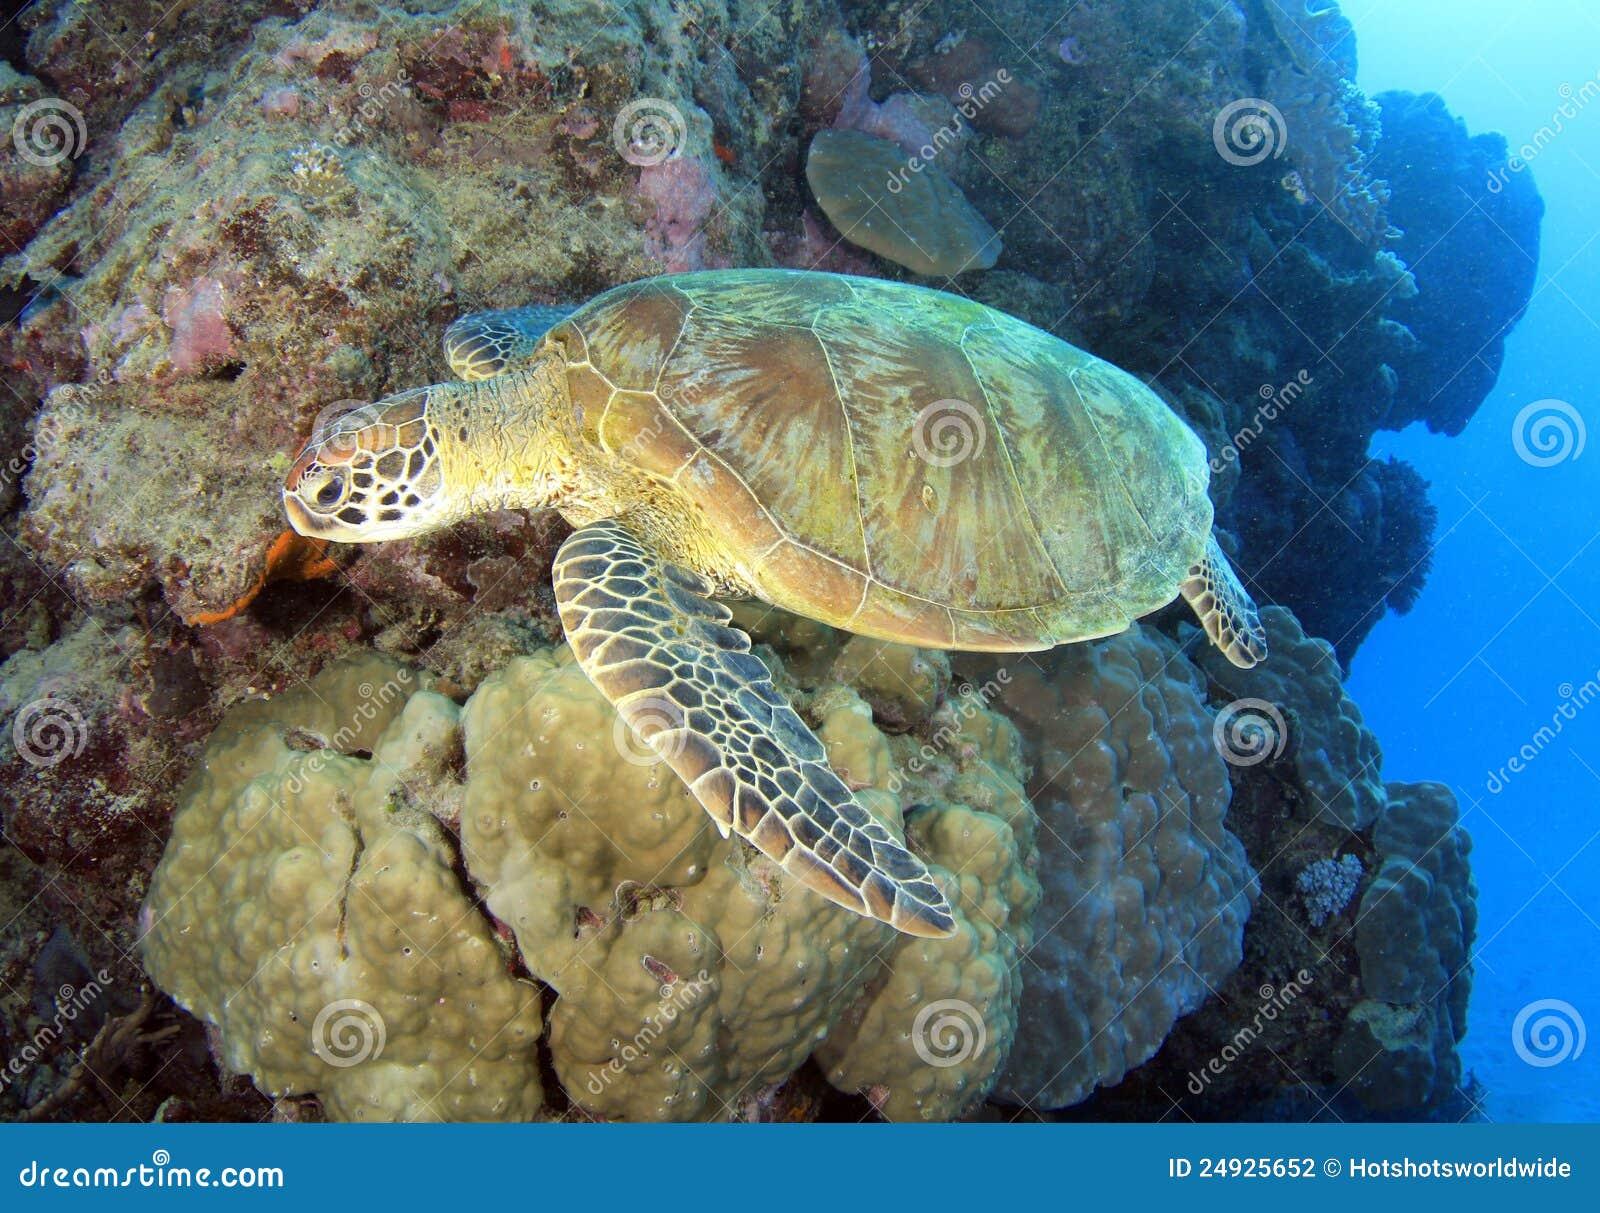 Tartaruga verde, grande recife de barreira, montes de pedras, Austrália